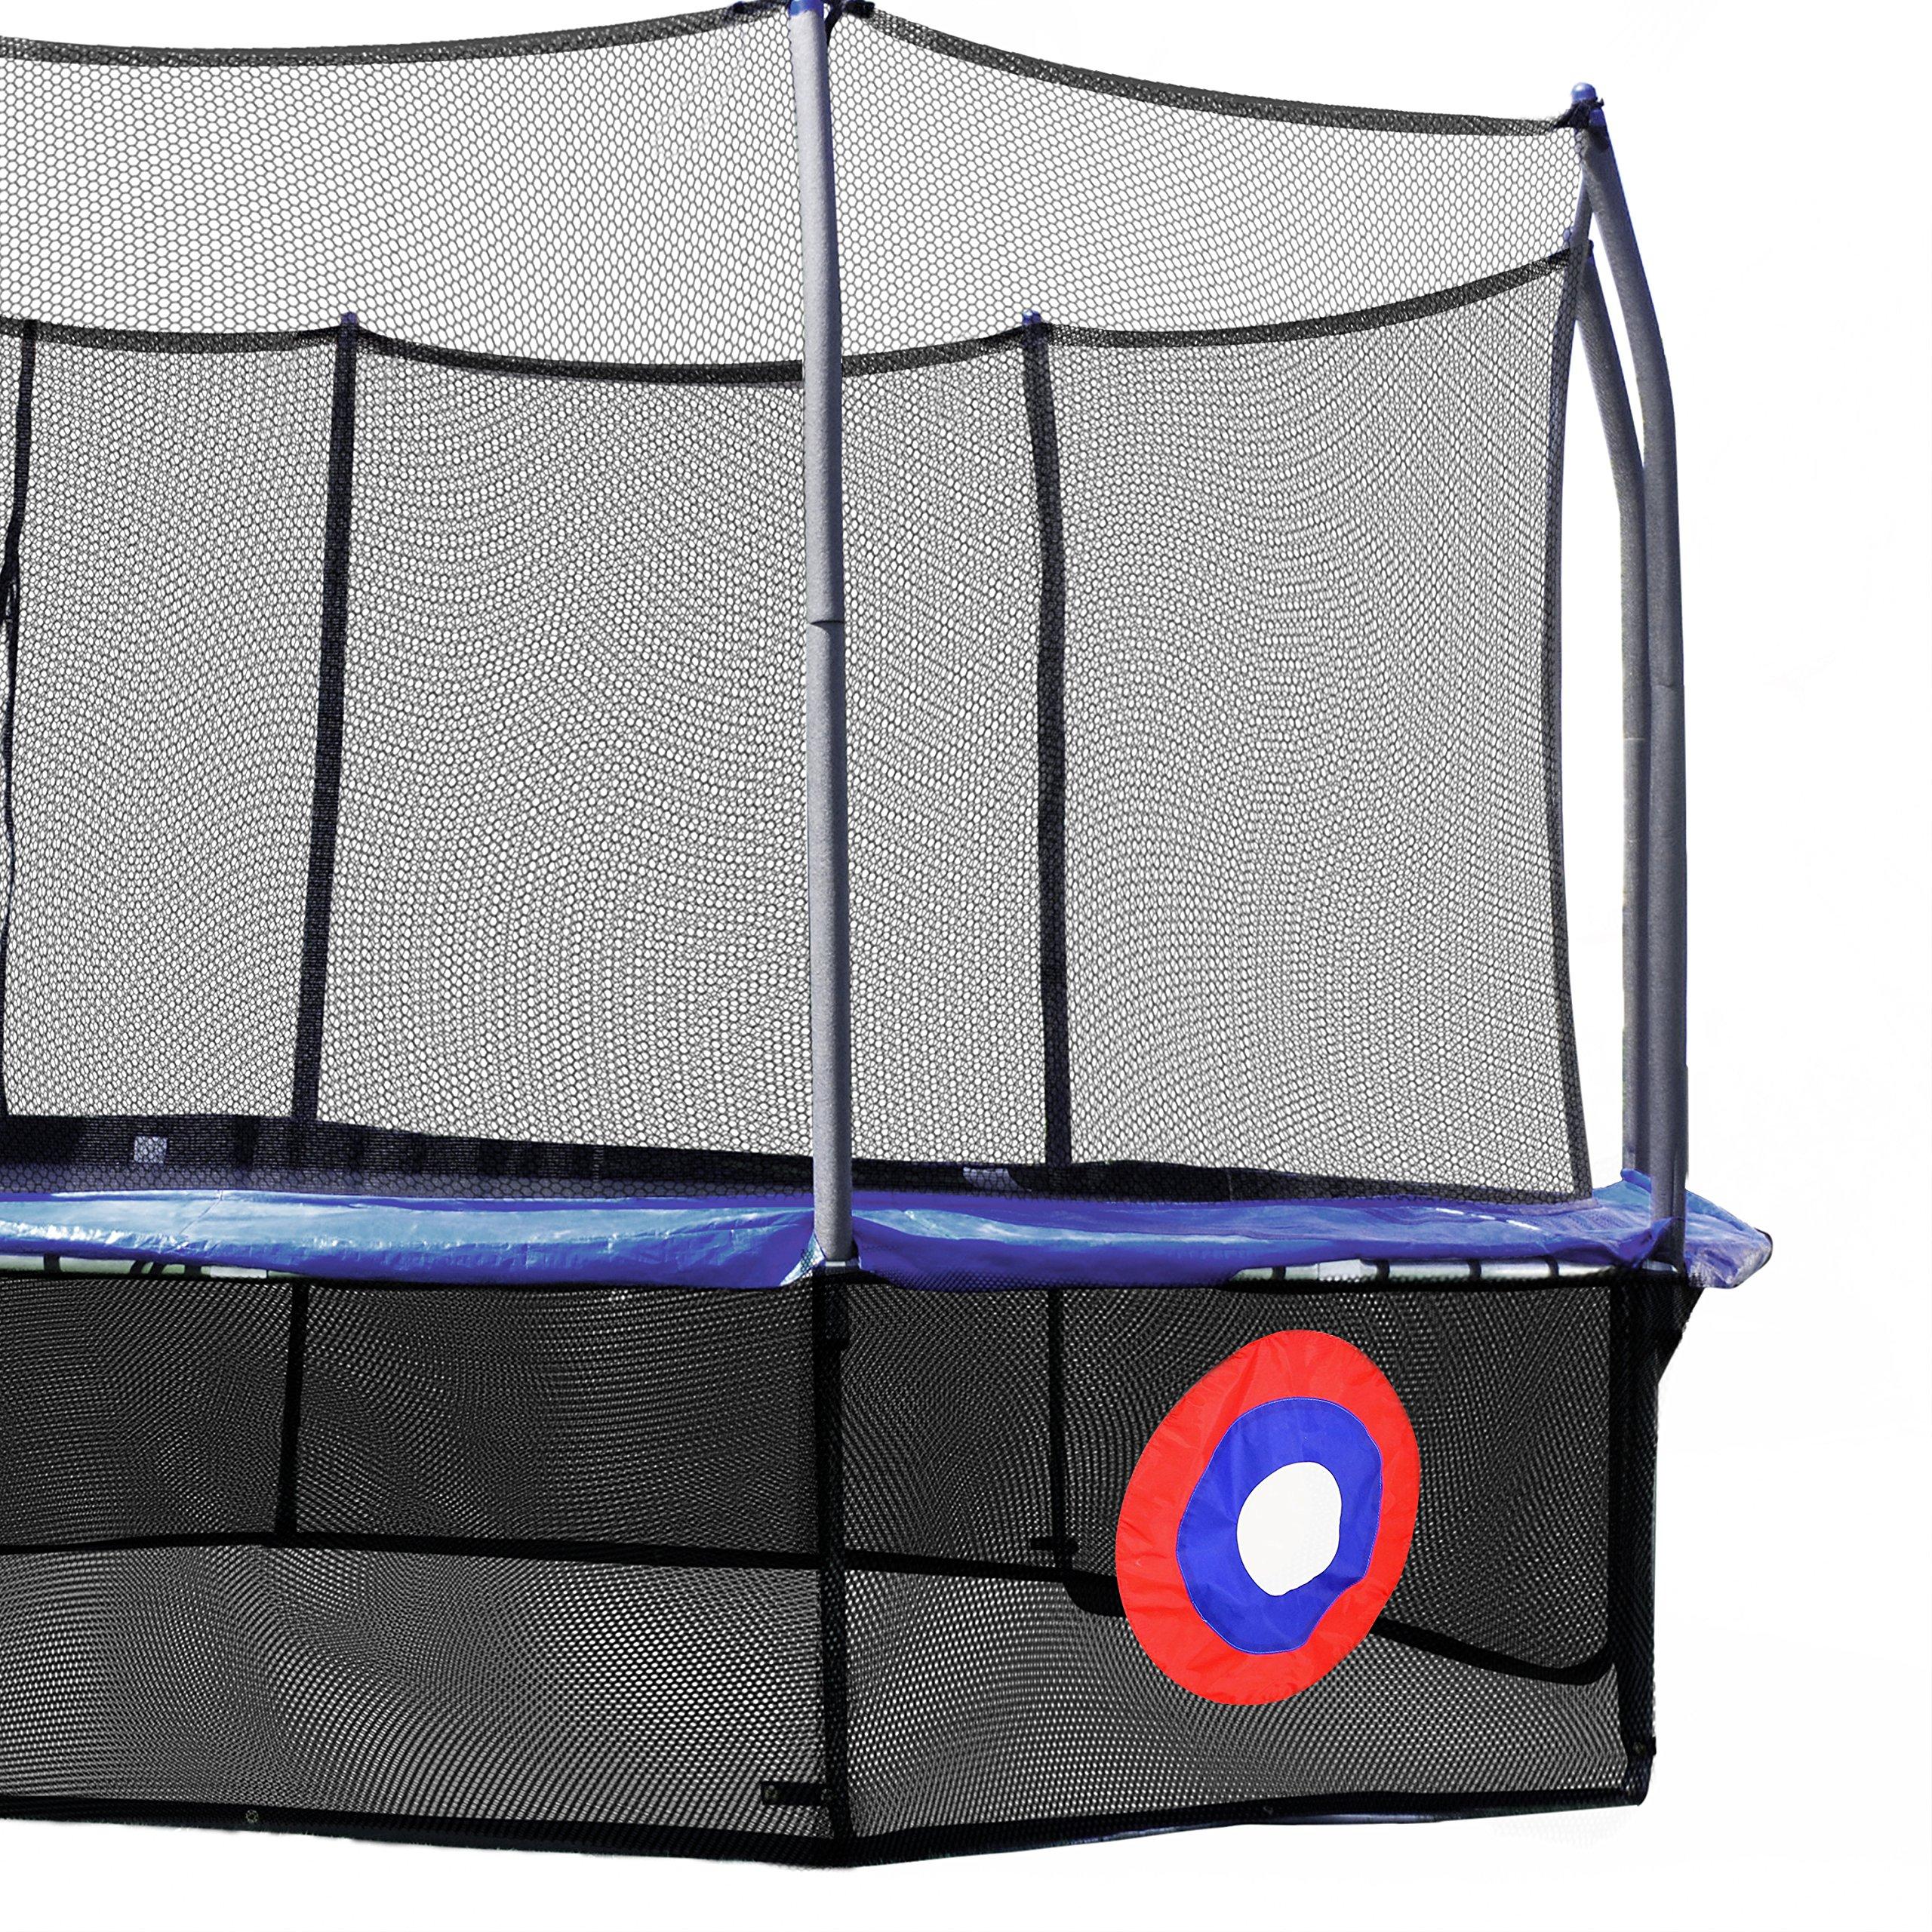 Skywalker Trampolines Sure Shot Lower Enclosure Net Accessory Game by Skywalker Trampolines